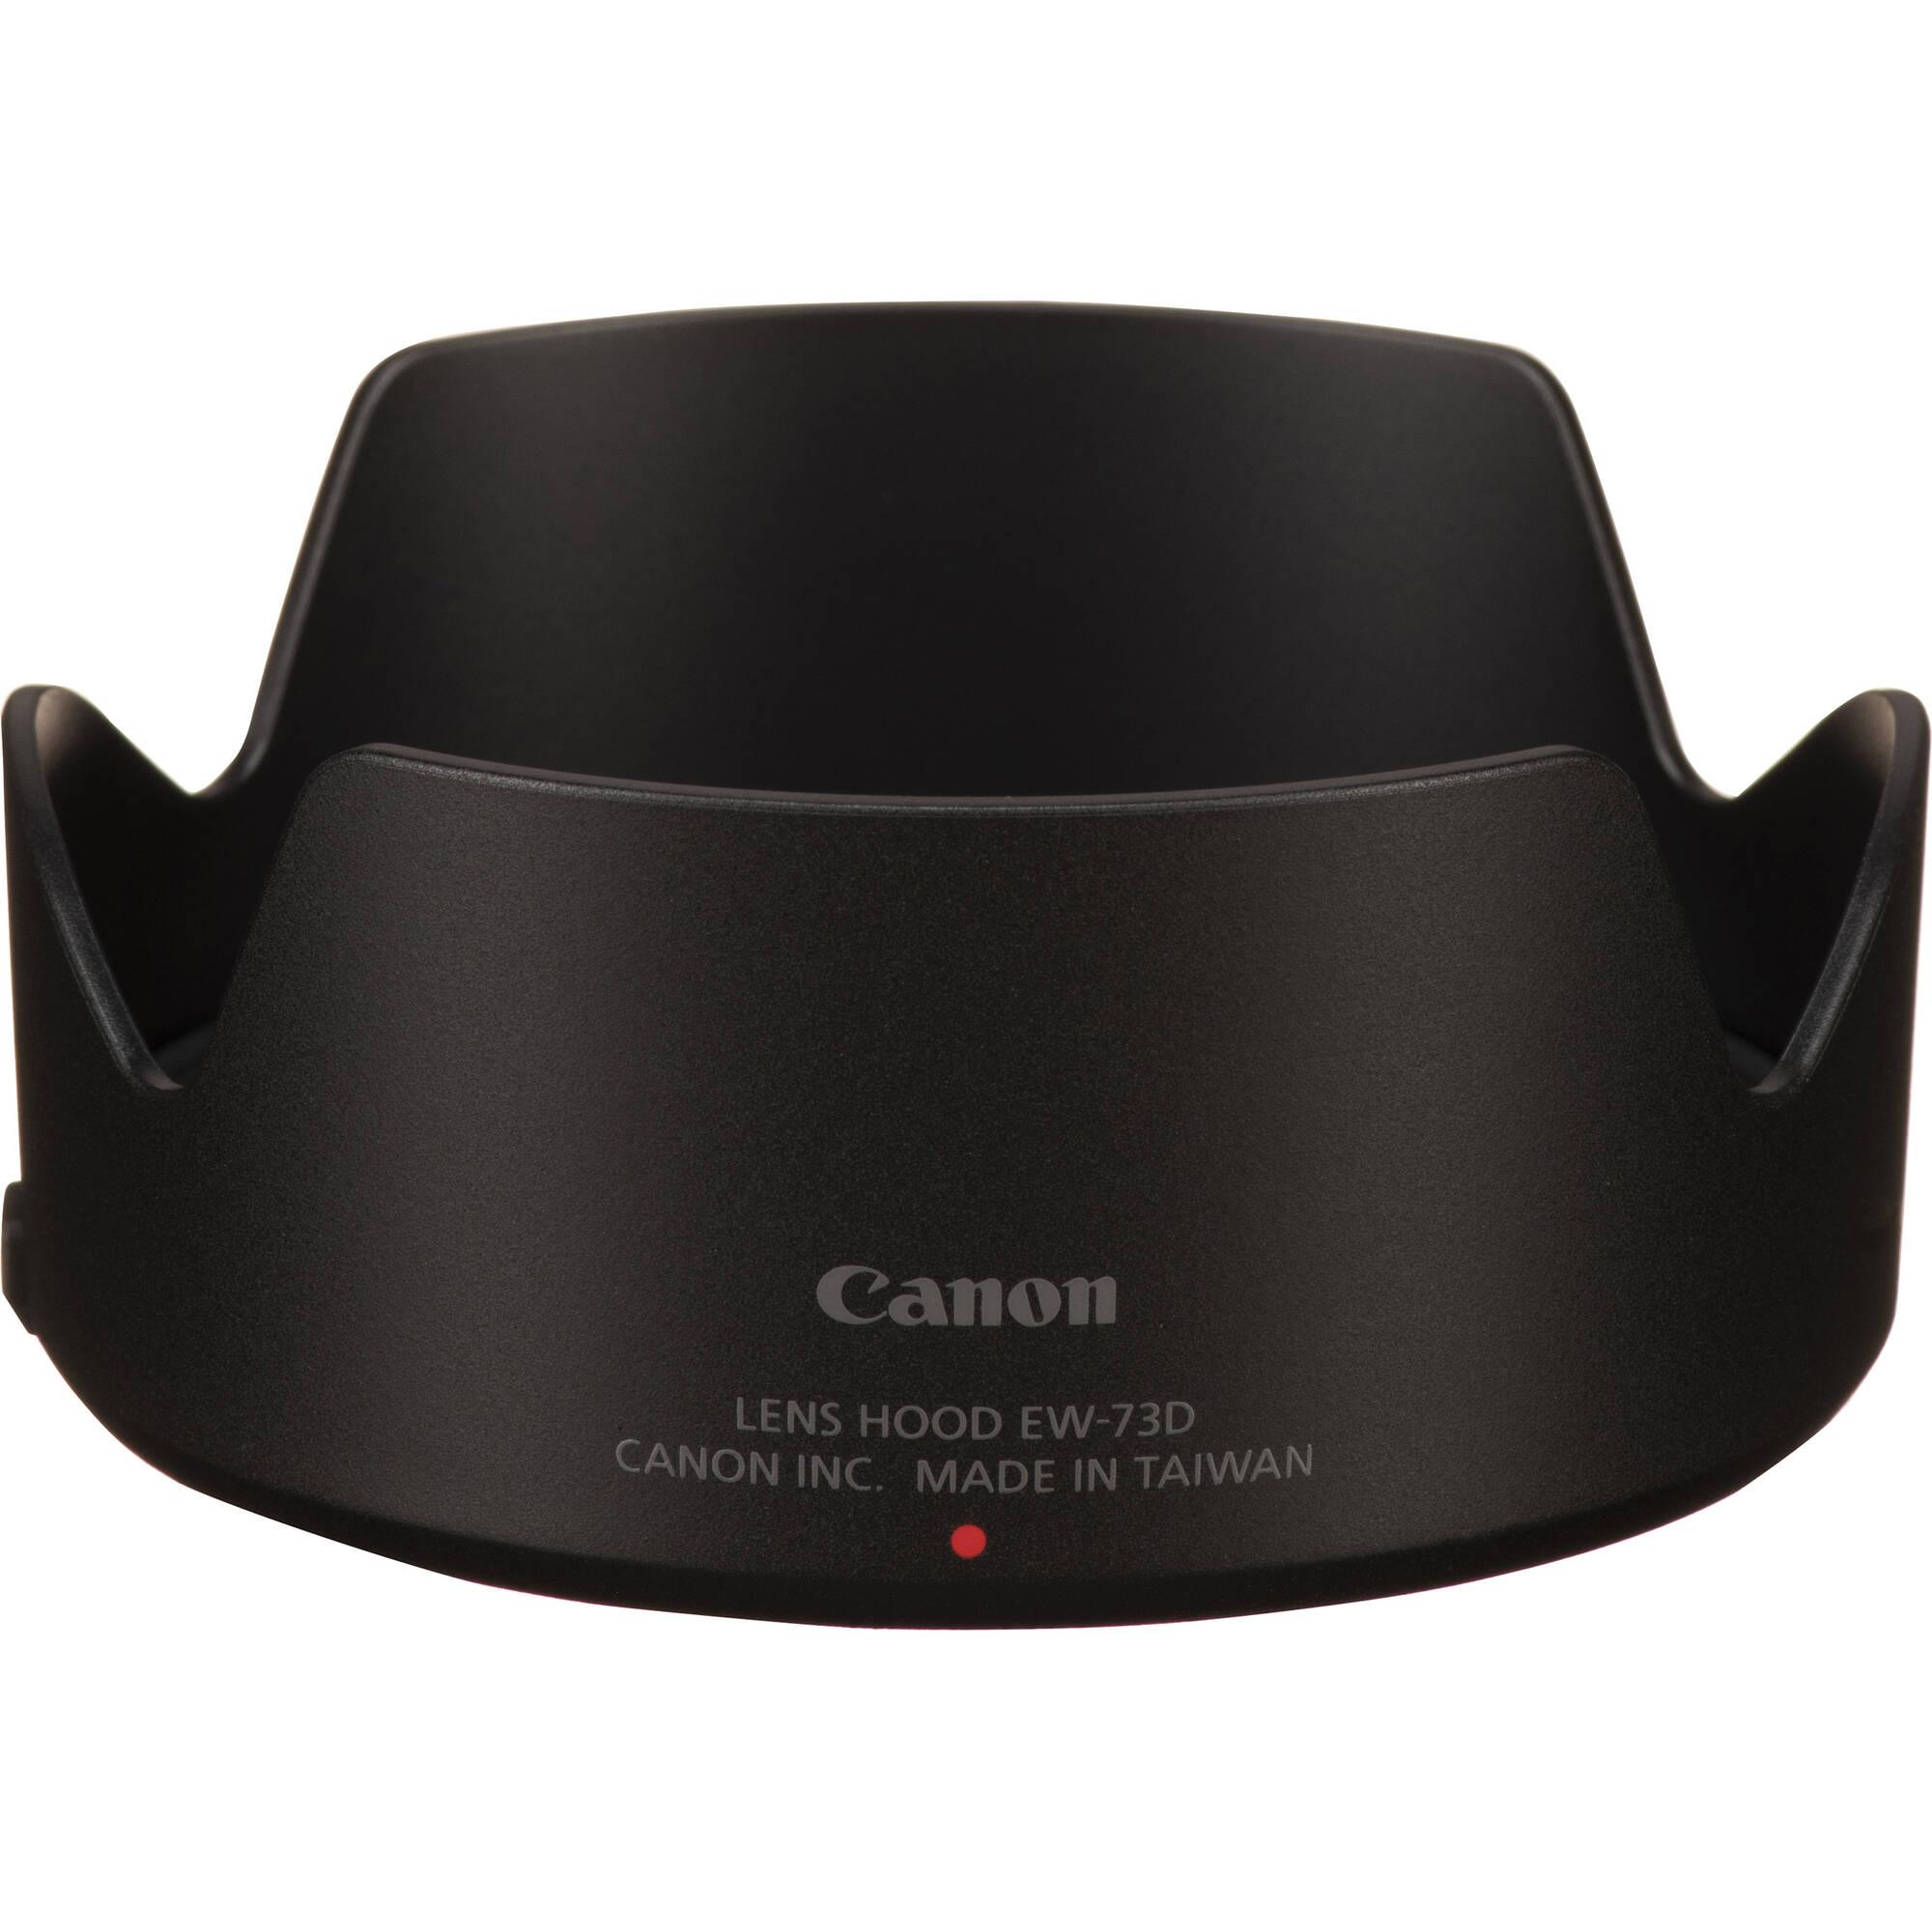 canon_1277c001_ew_73d_lens_hood_1225882.jpg (2000×2000)